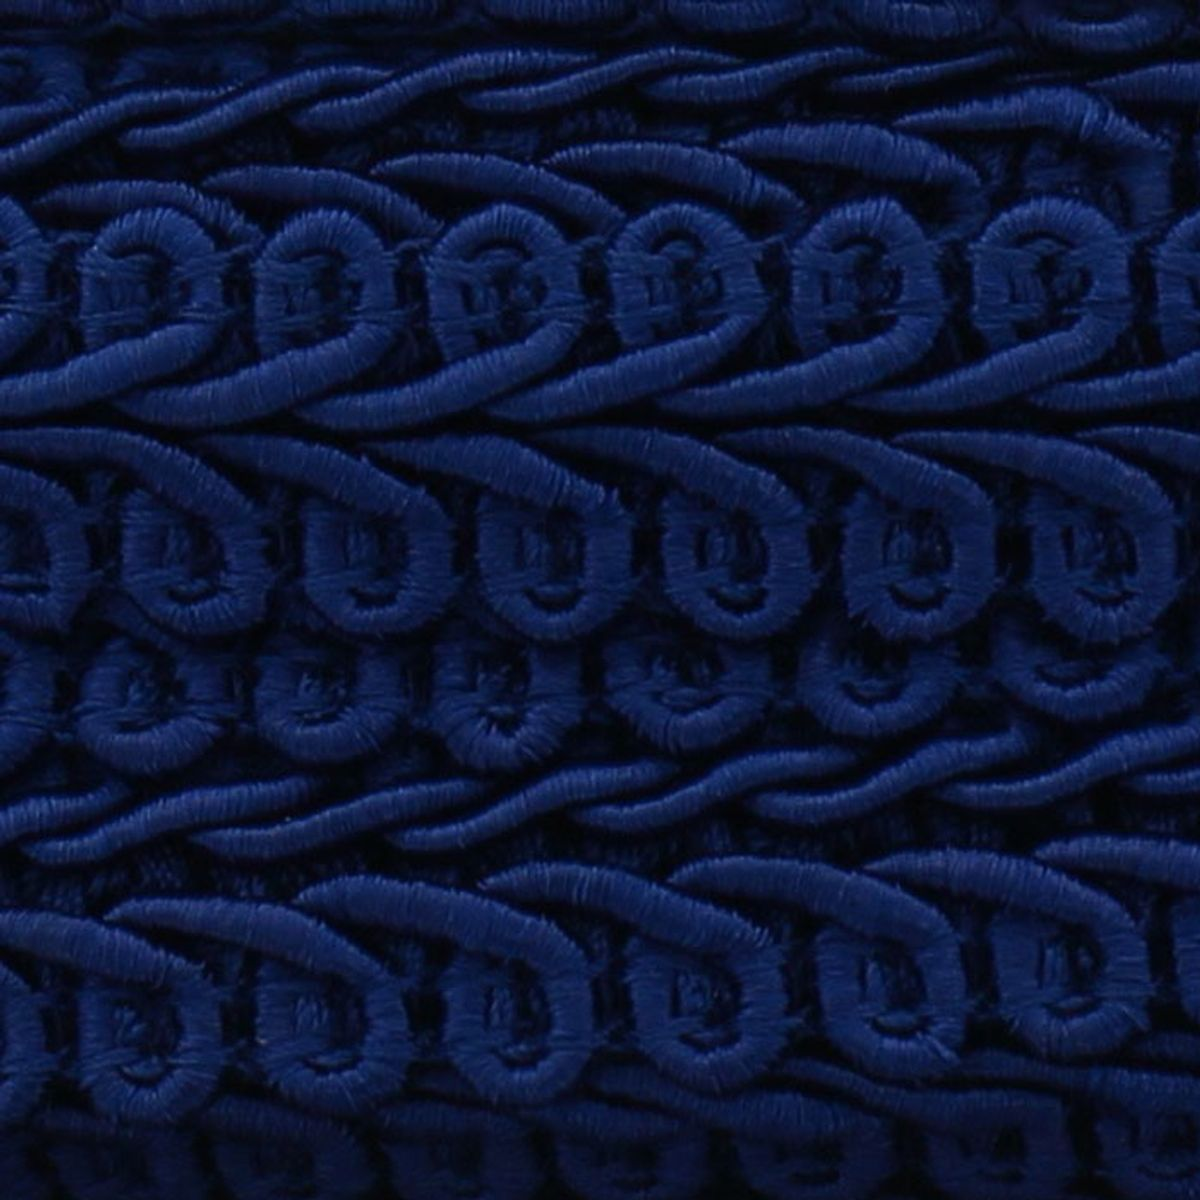 Galon épi style Chanel - Bleu marine